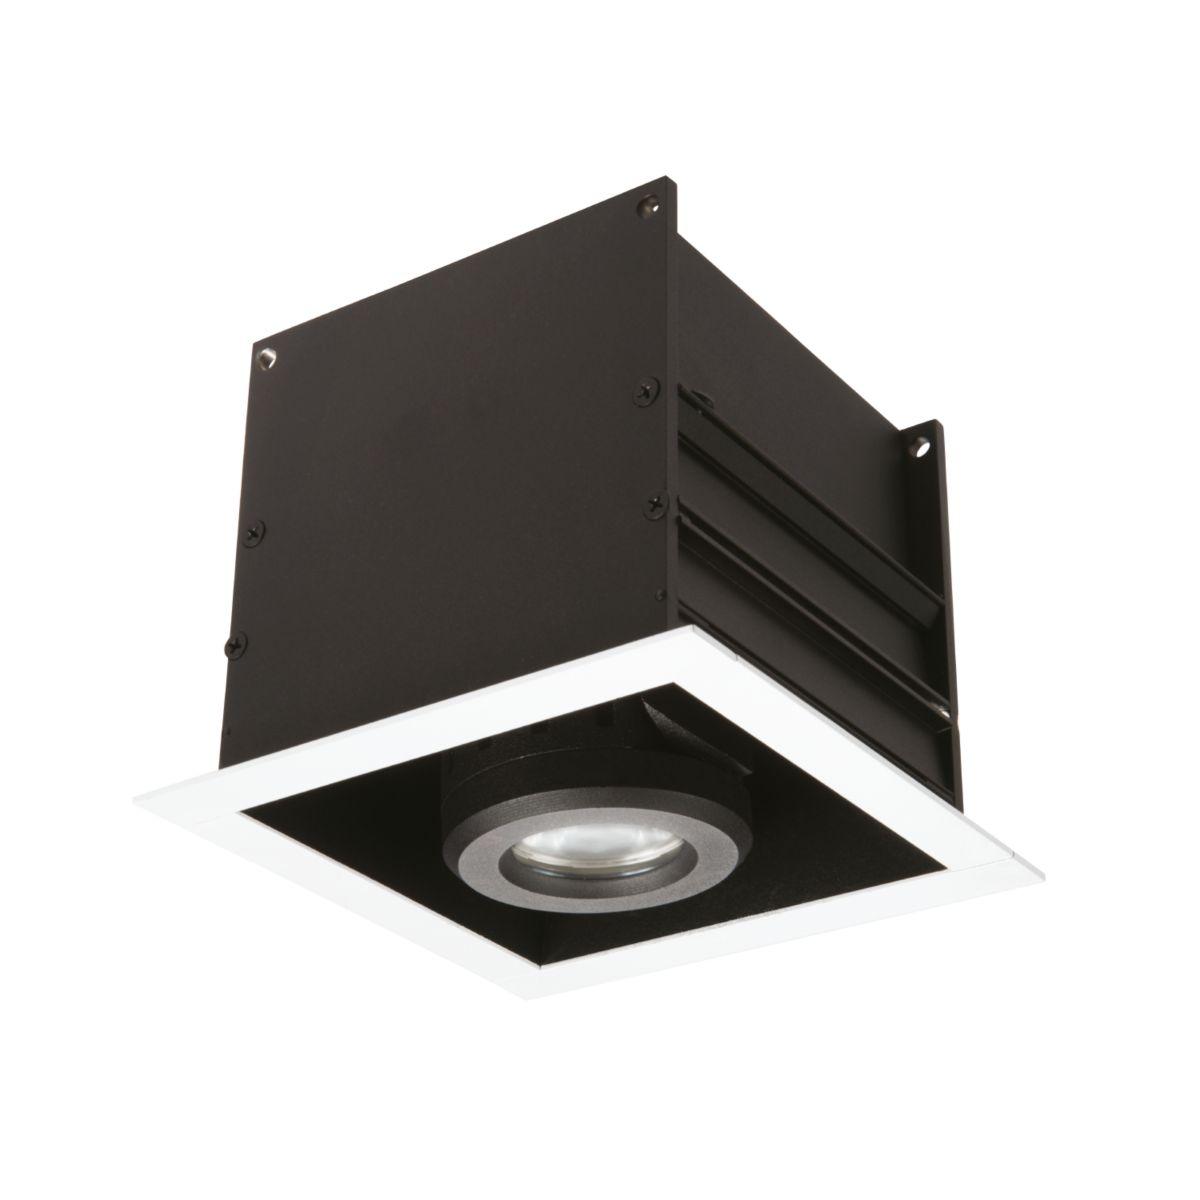 MRZ-1 Multi-Head Recessed Integral LED